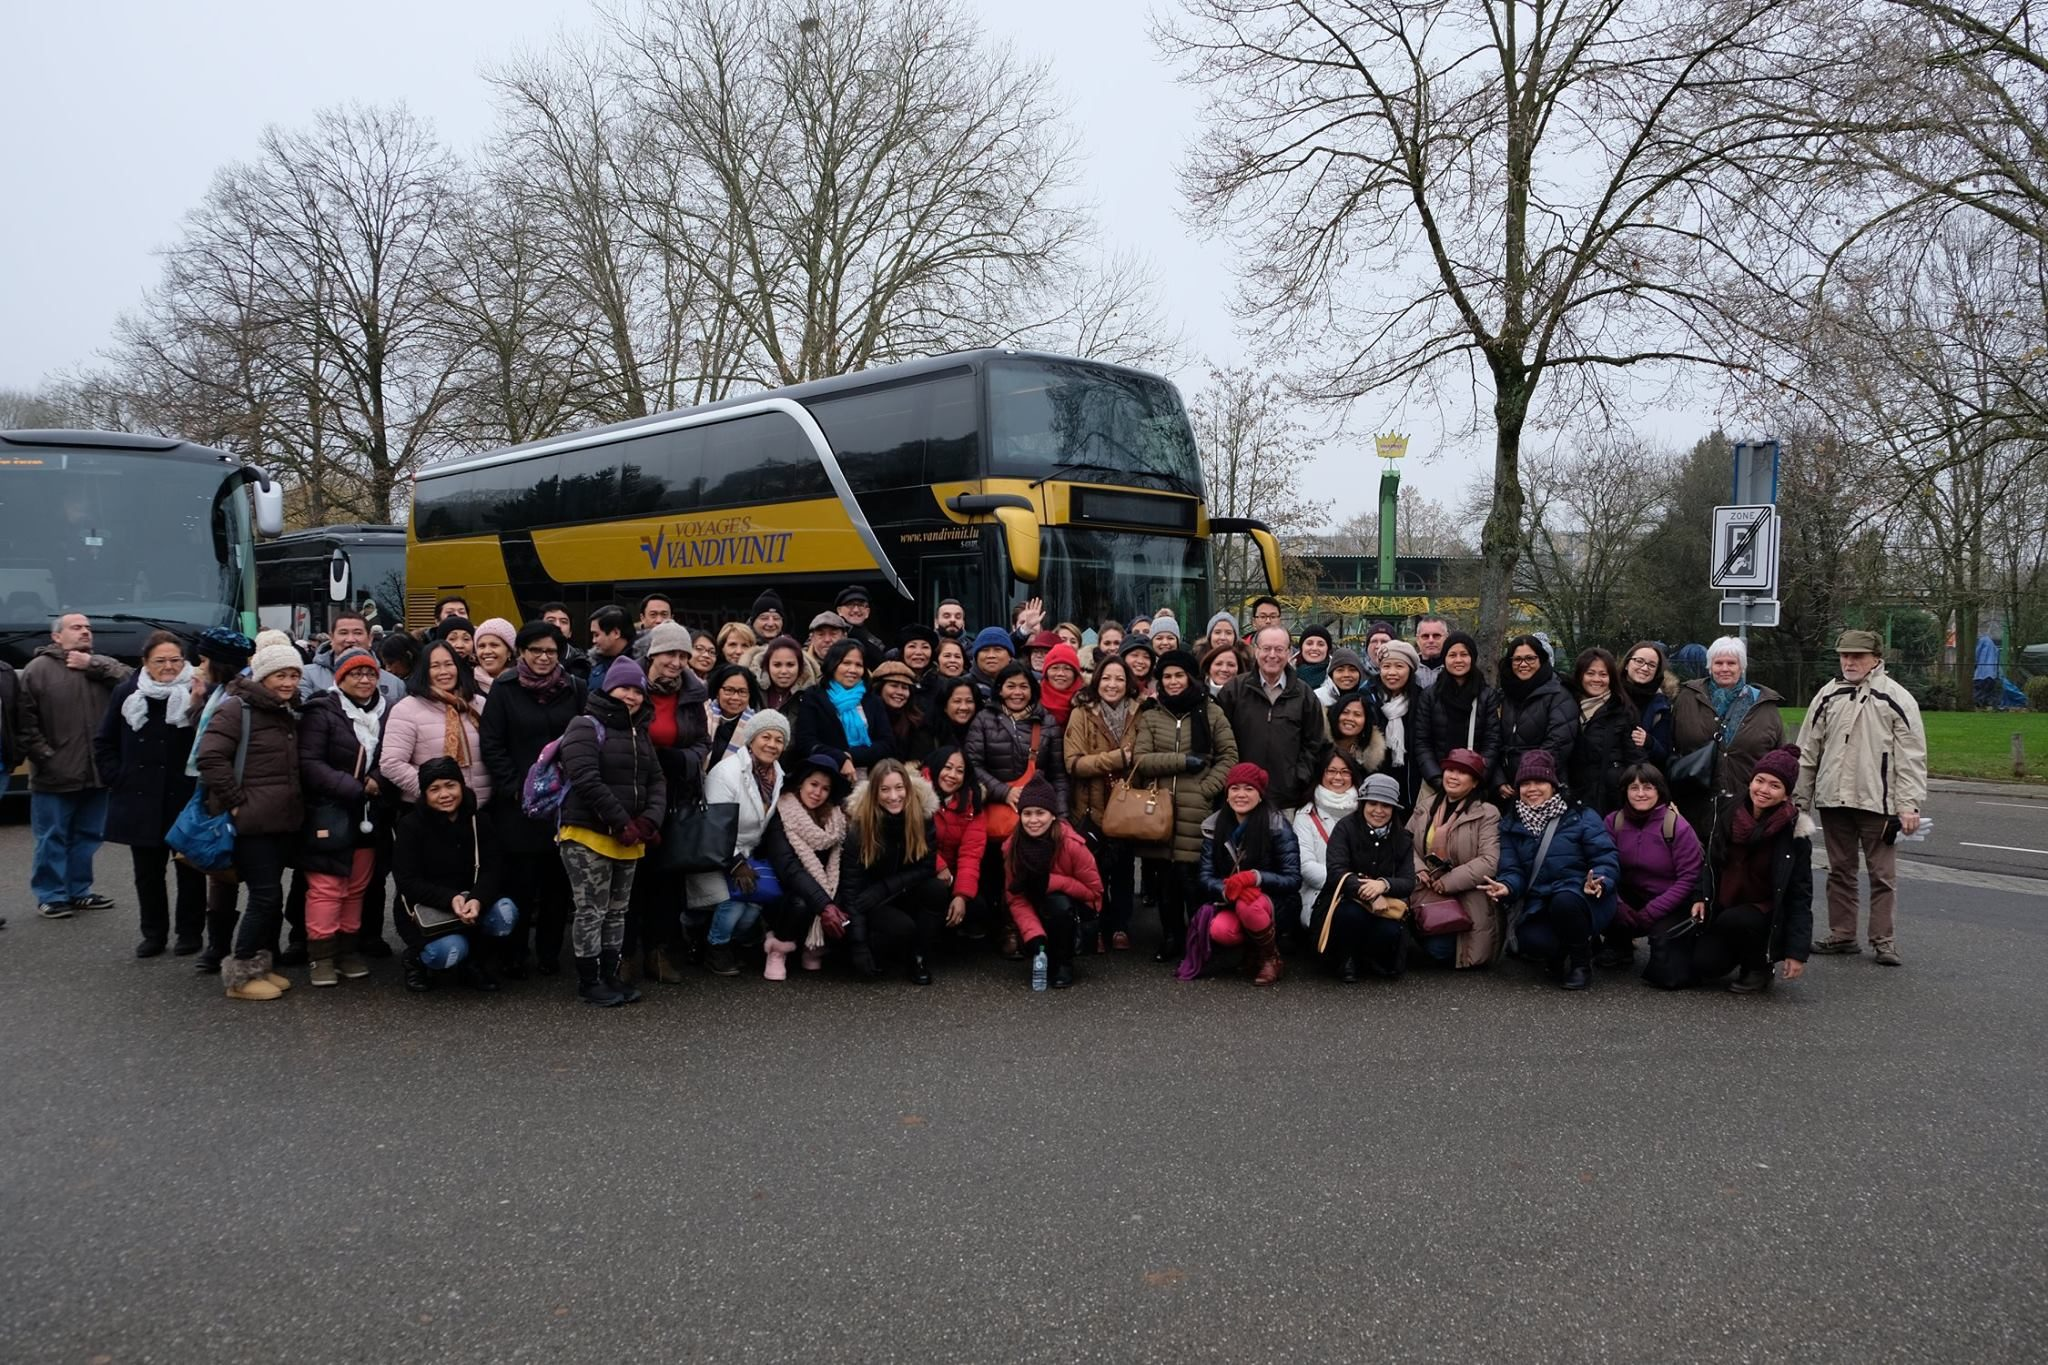 Valkenburg Christmas Market Bus Trip